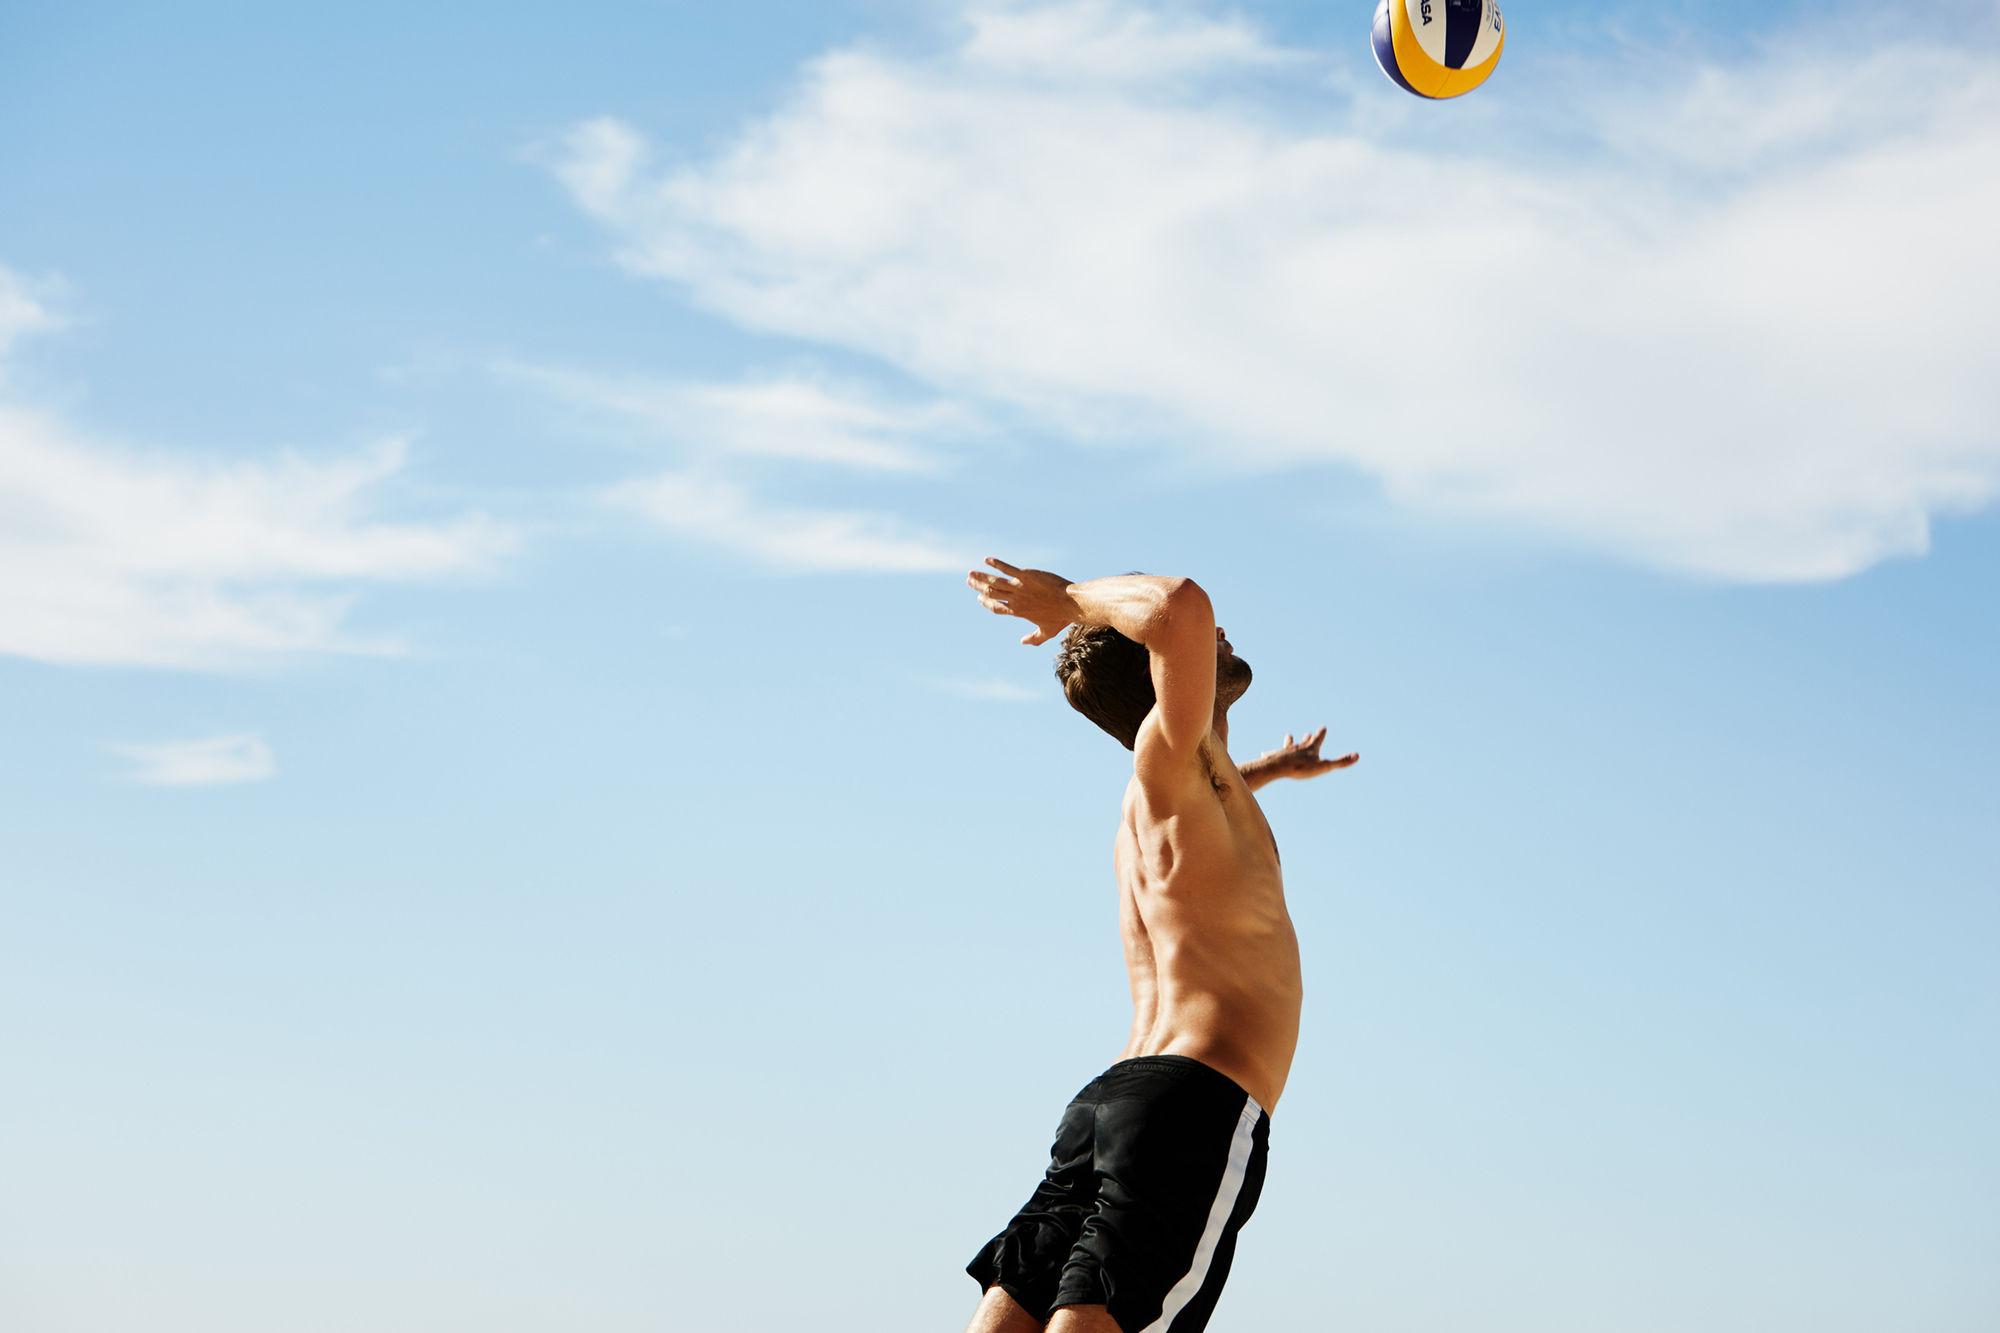 EMEIS DEUBEL: Richard Johnson Volleyball in Cape Town